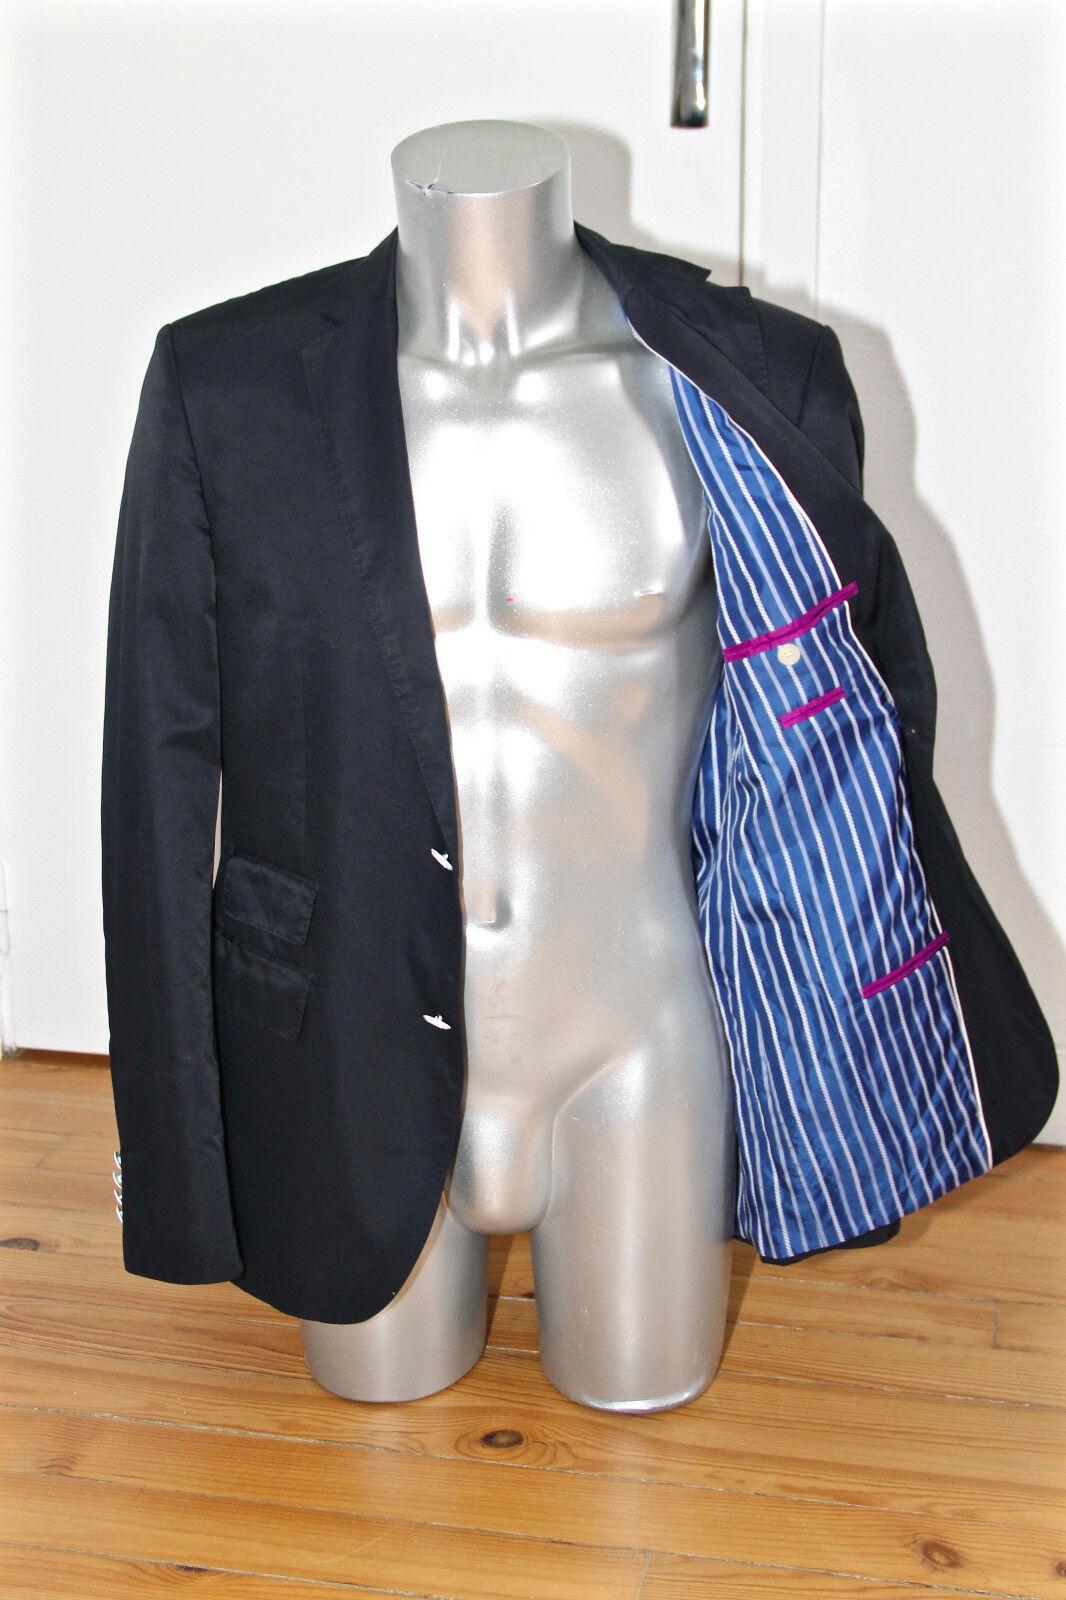 HUGO BOSS sweet giacca per abito slim fit encoton nylon blu navy TAGLIA 50